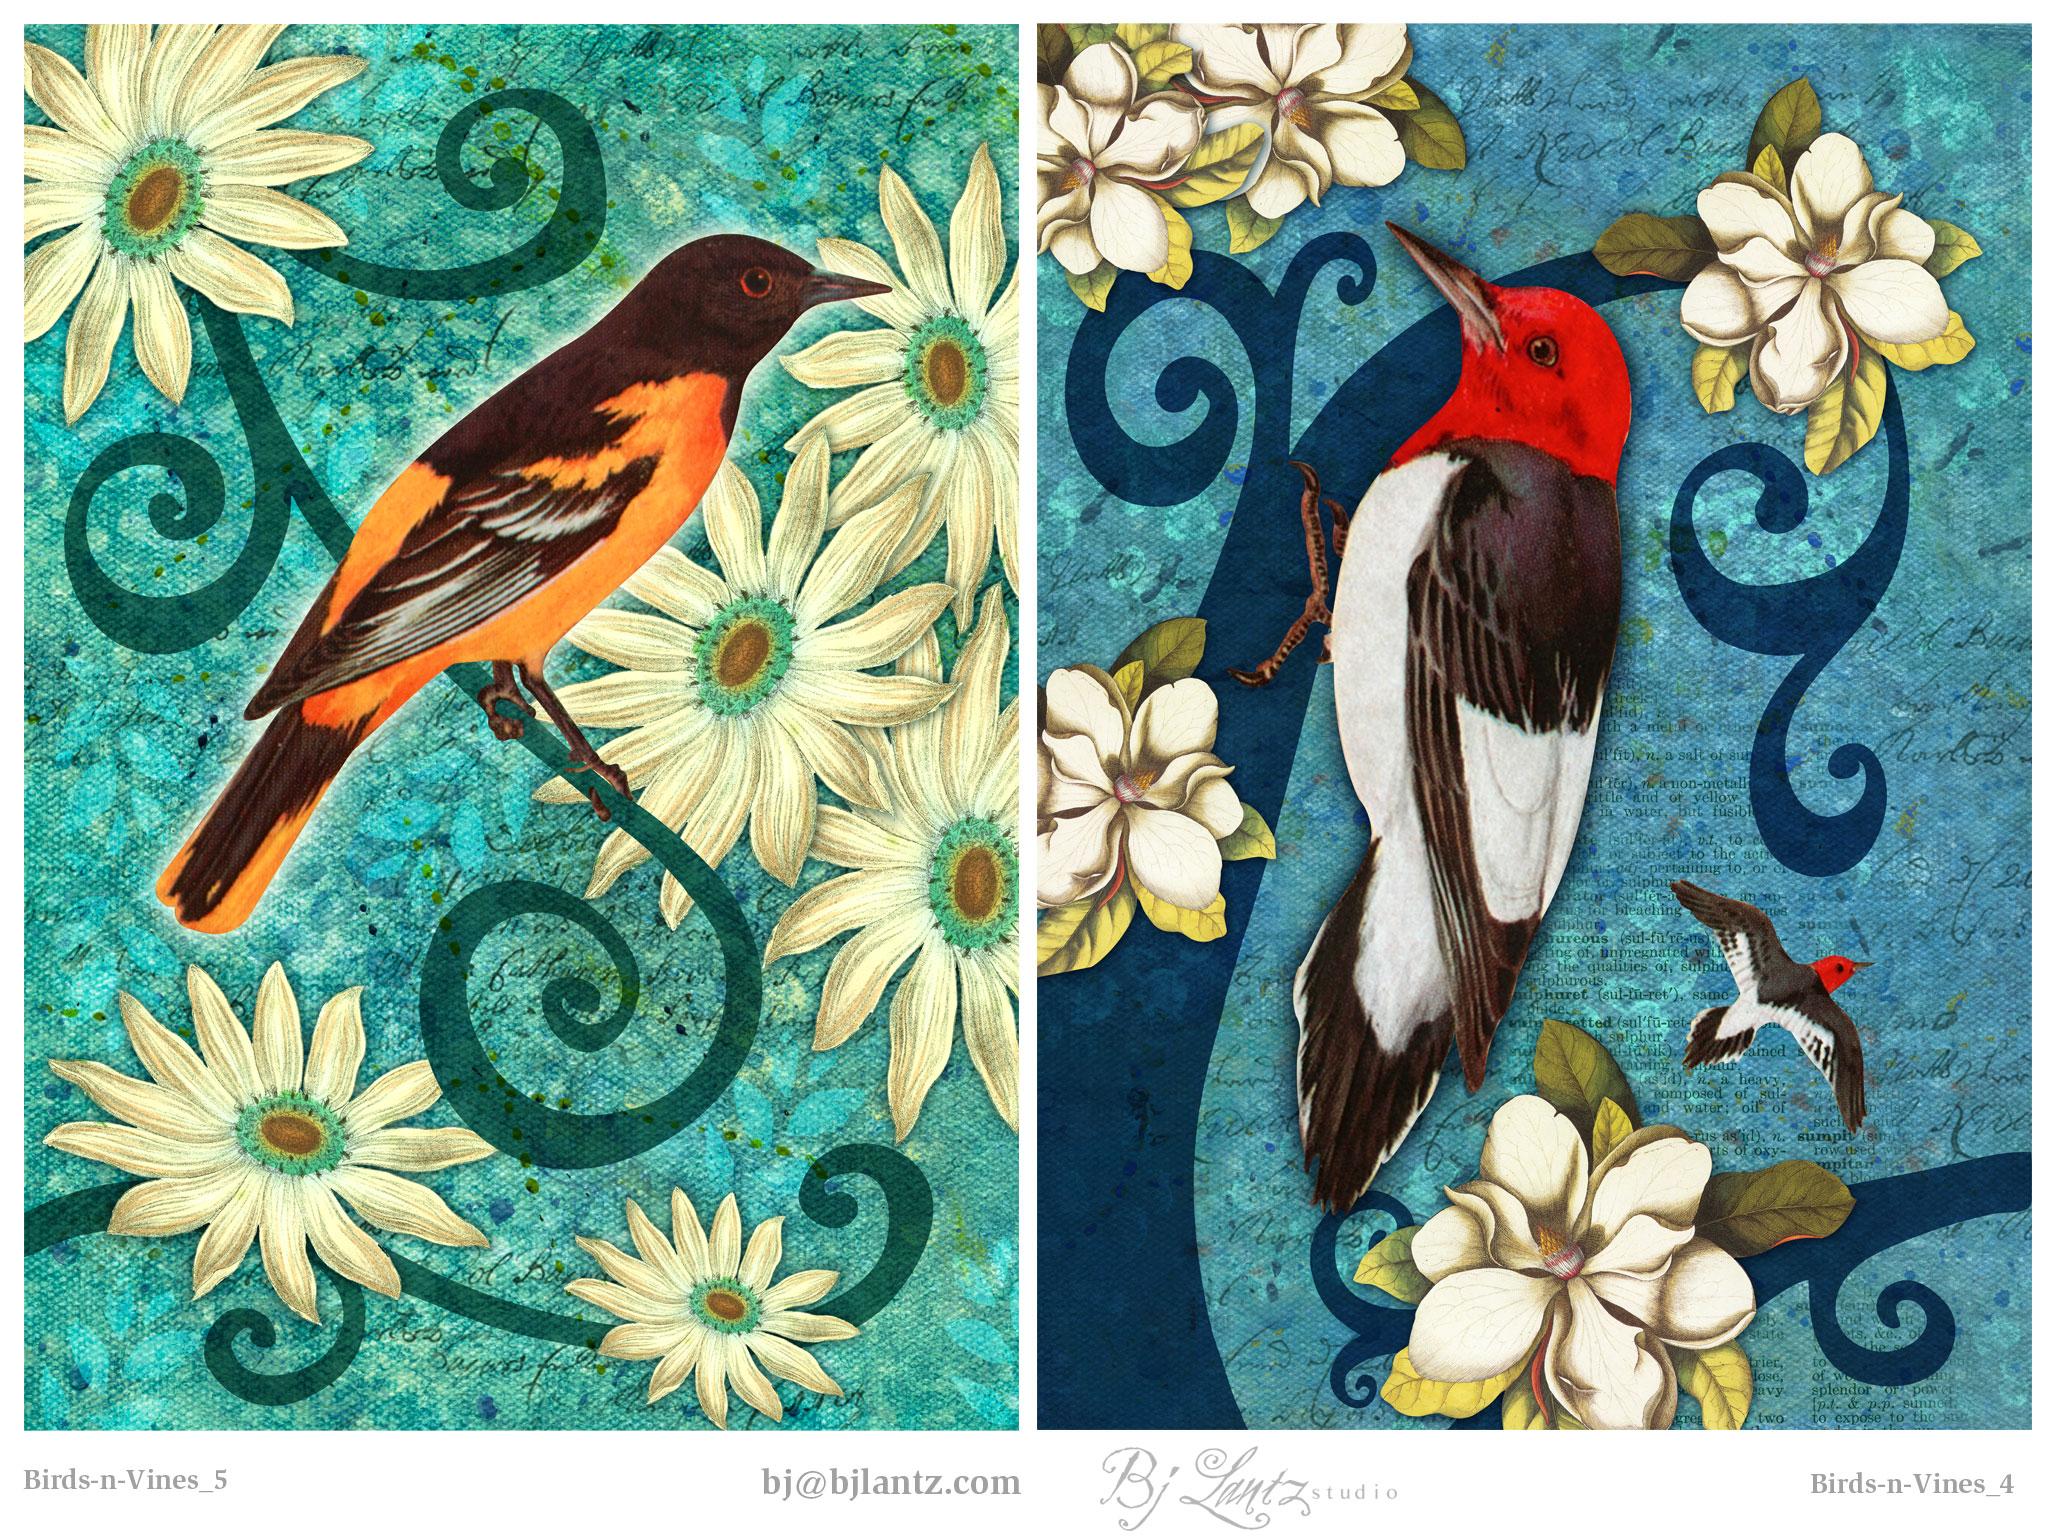 Birds-n-Vines_BJLantz_9.jpg